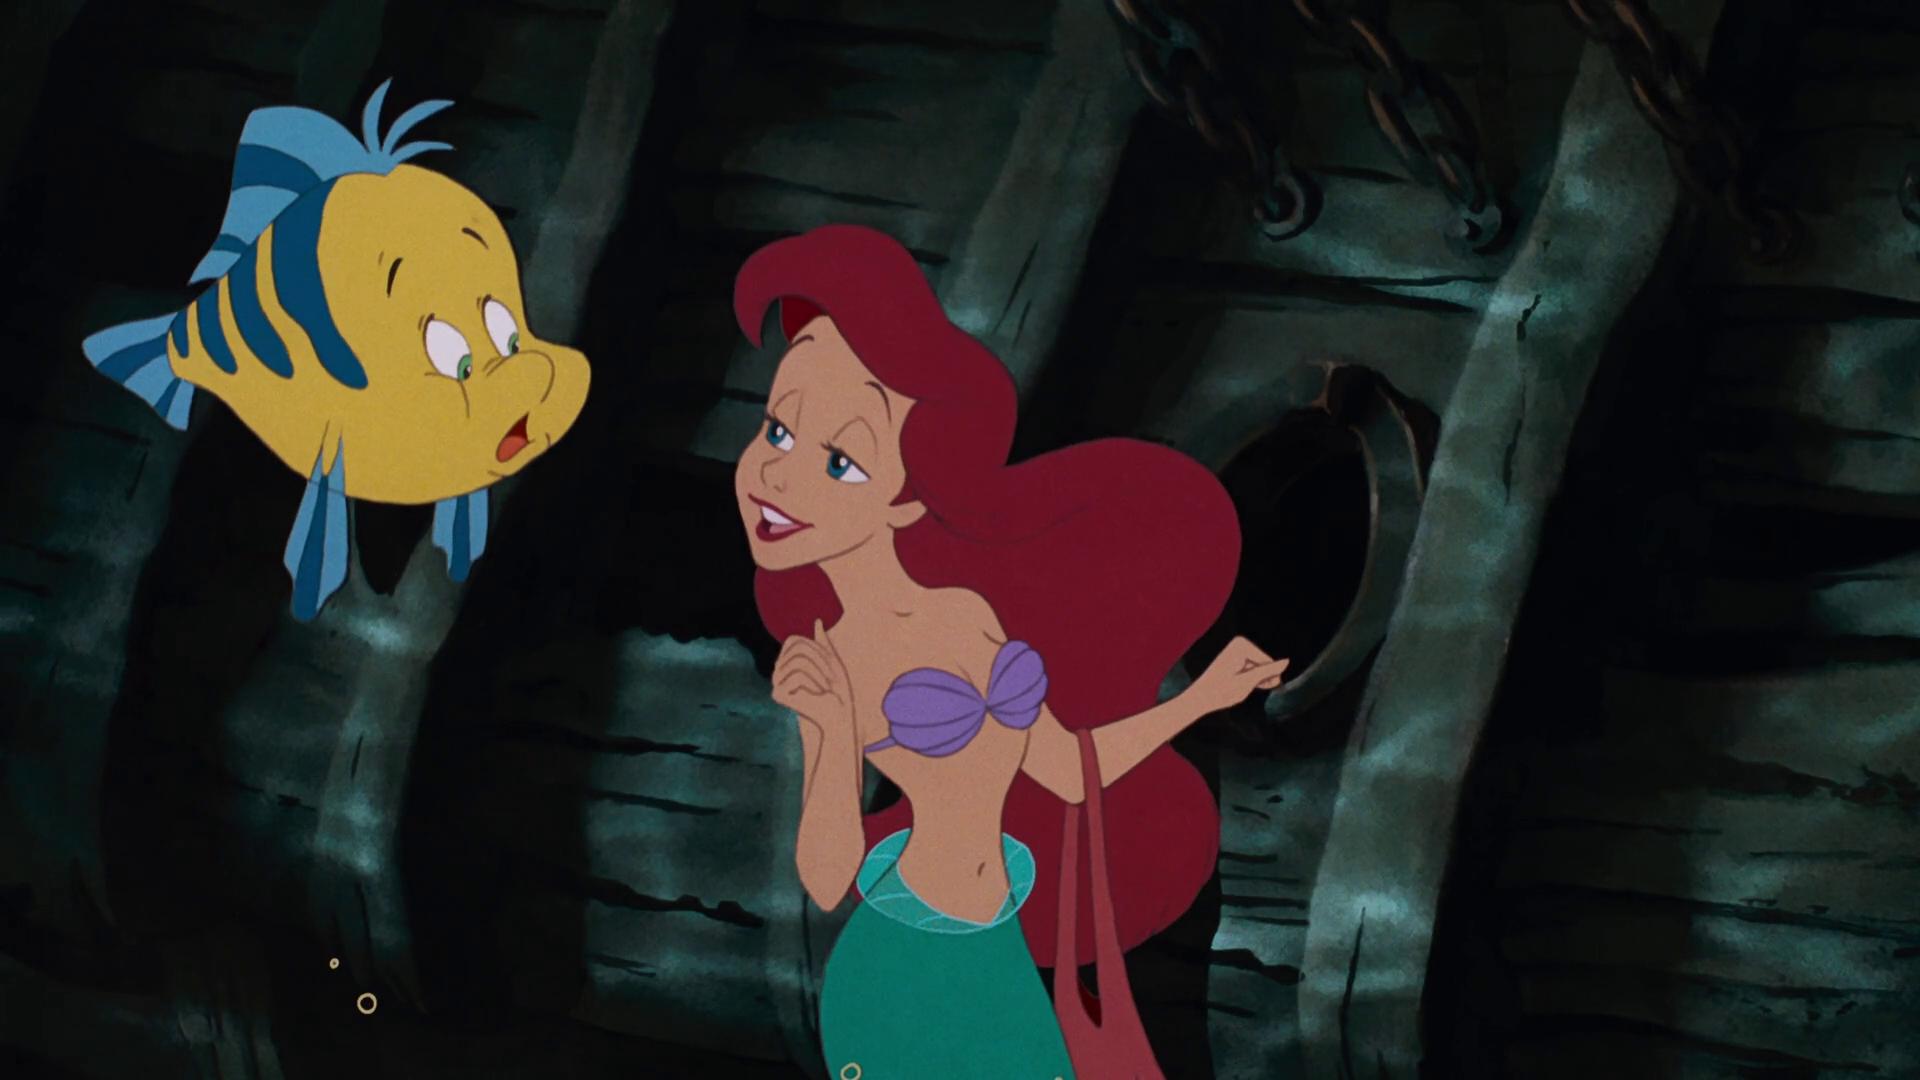 the little mermaid 1989 1080p engita x264 bluray la